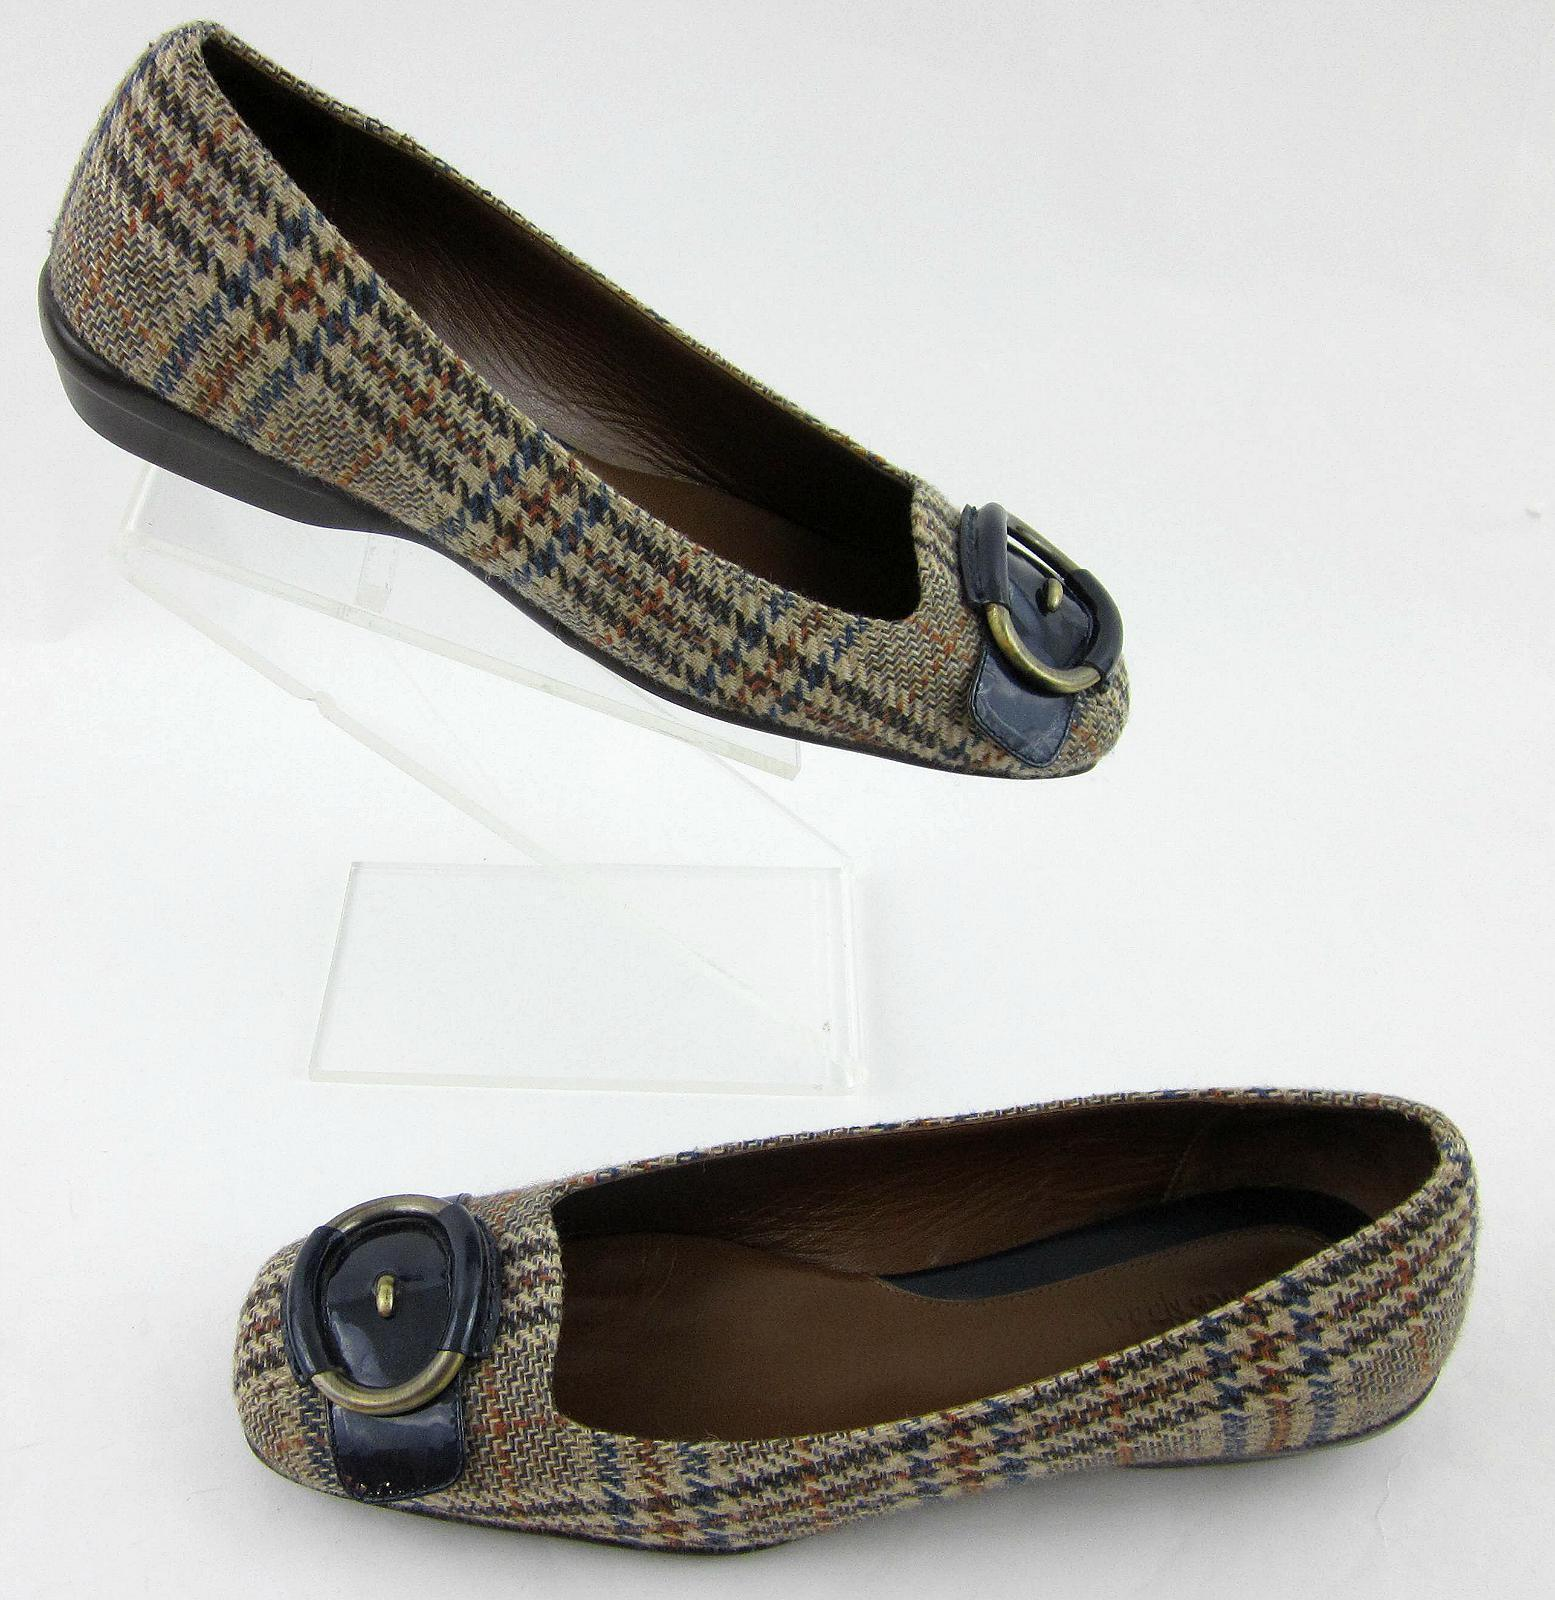 Cole Haan Air donna donna donna Flats Plaid Fabric blu Patent Strap Sz 7B 1fcd28